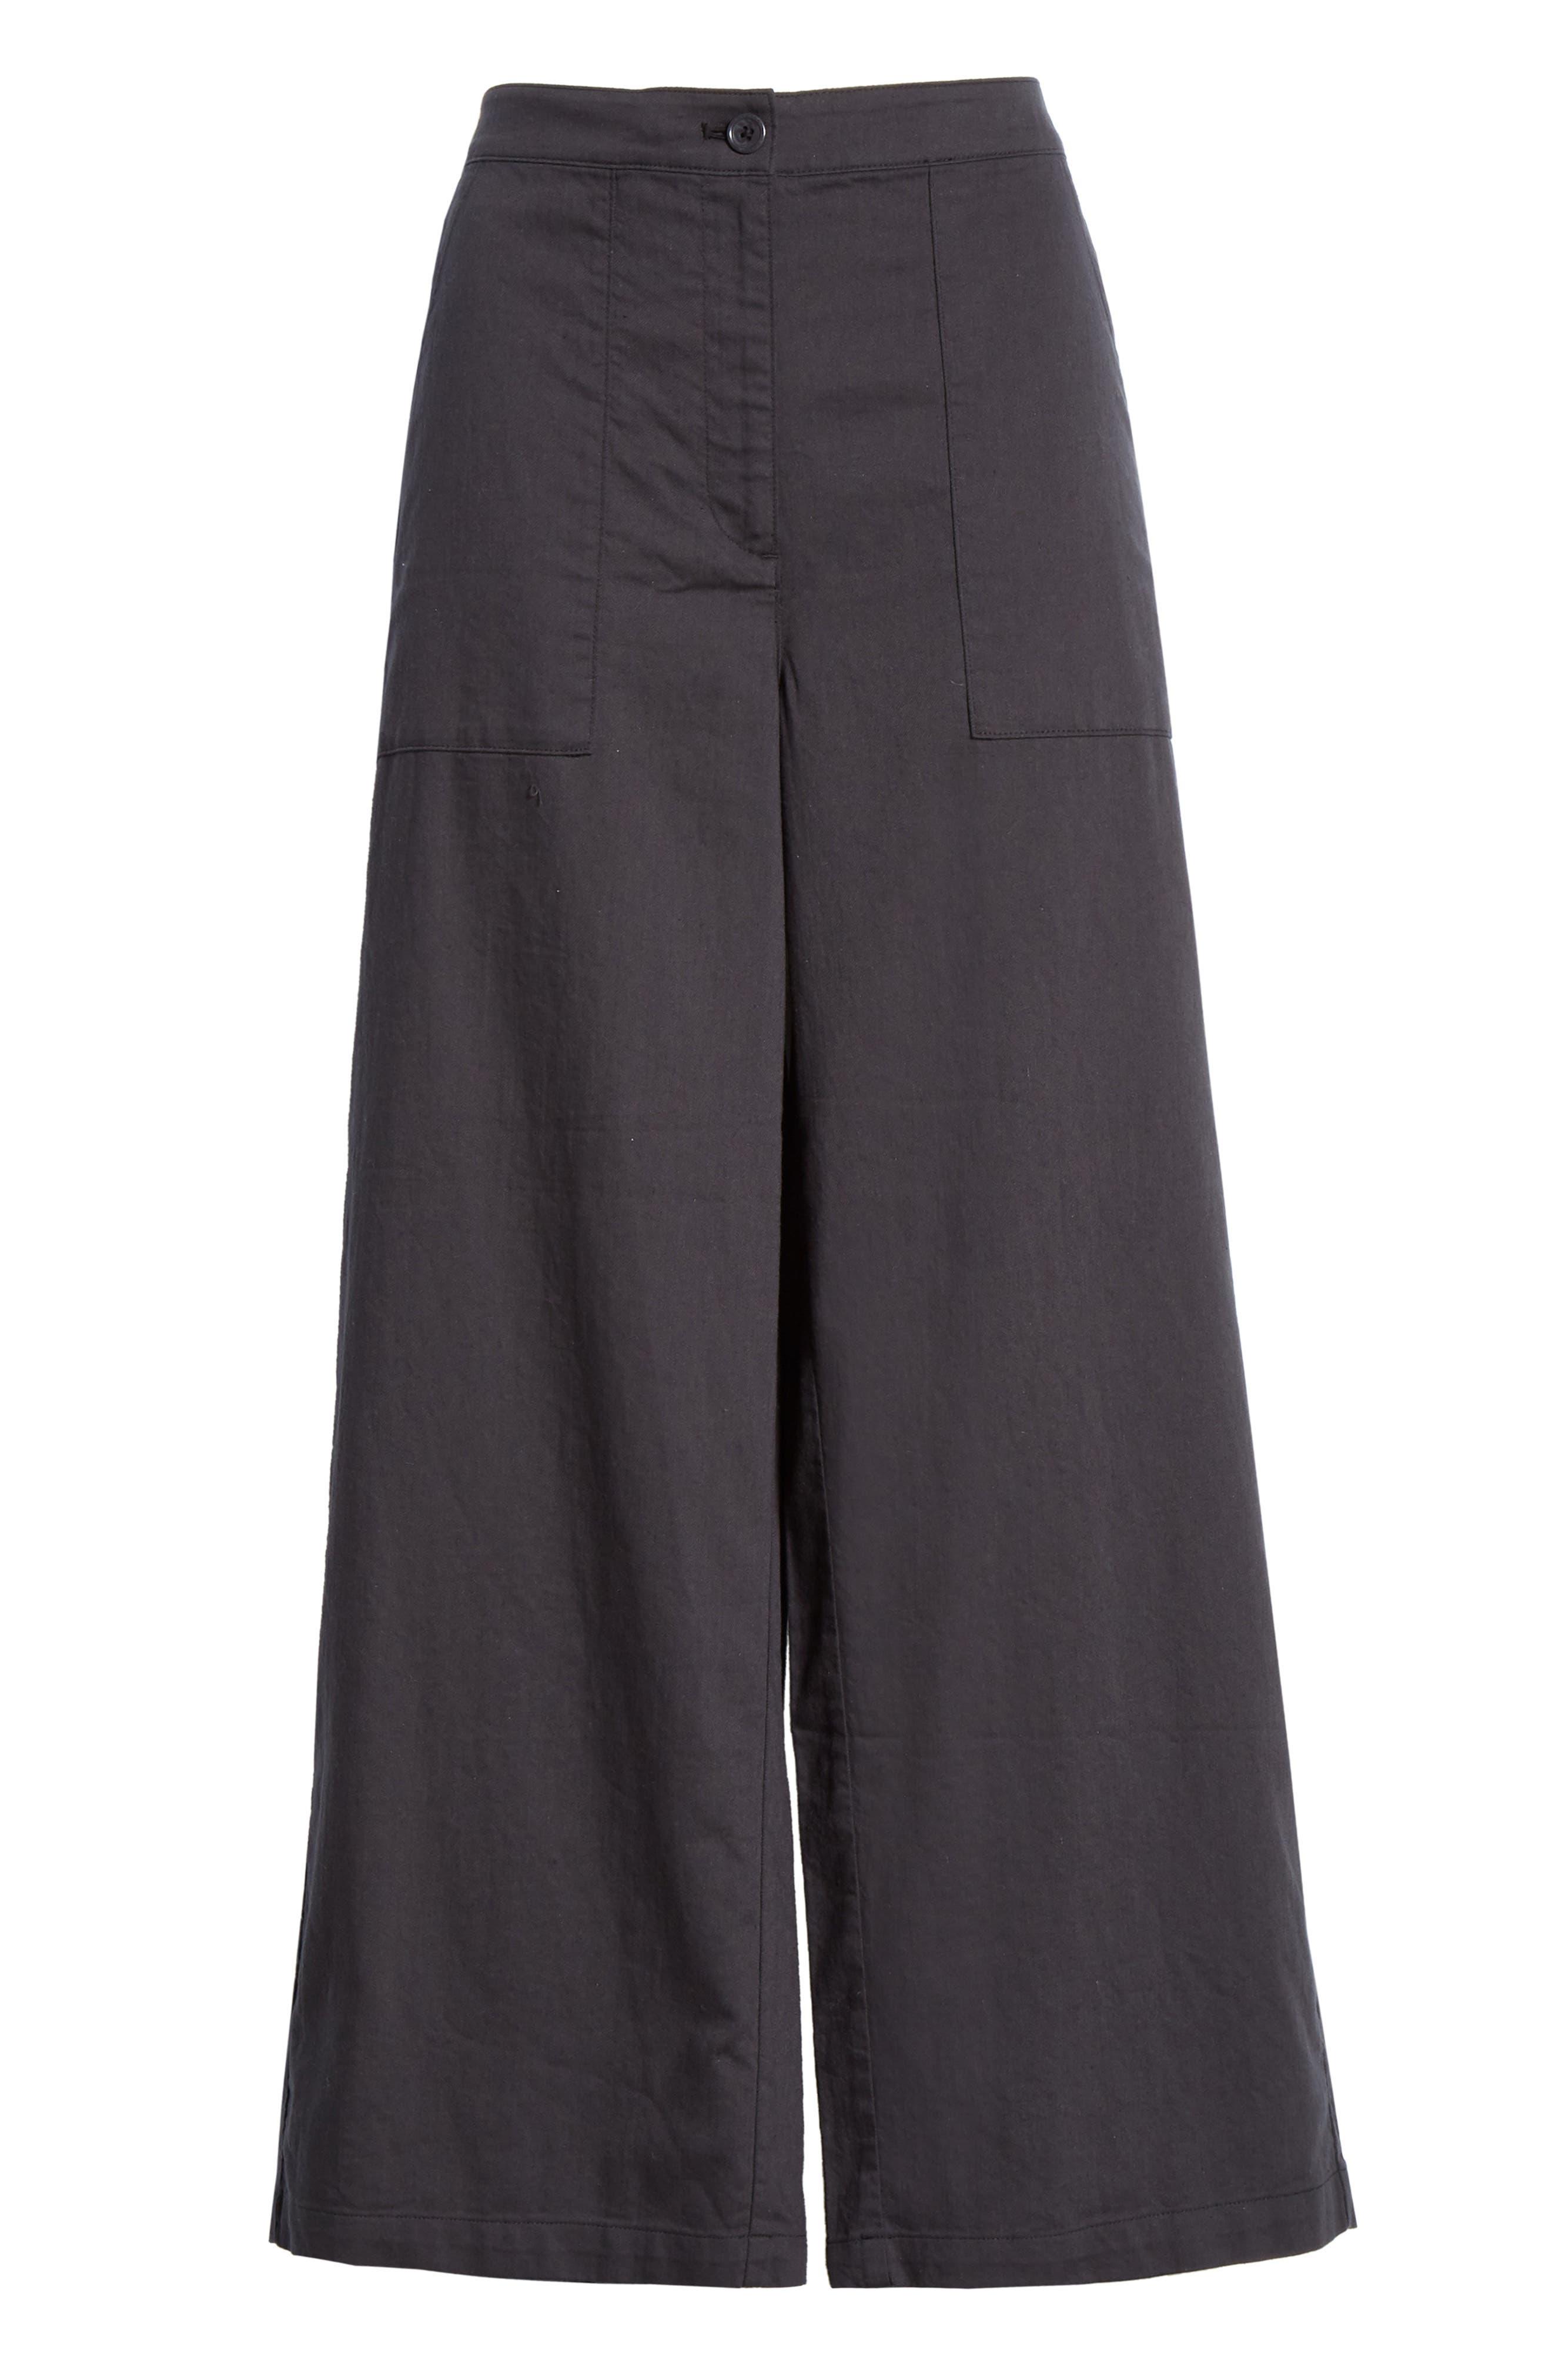 EILEEN FISHER, Organic Cotton Wide Leg Pants, Alternate thumbnail 7, color, GRAPHITE